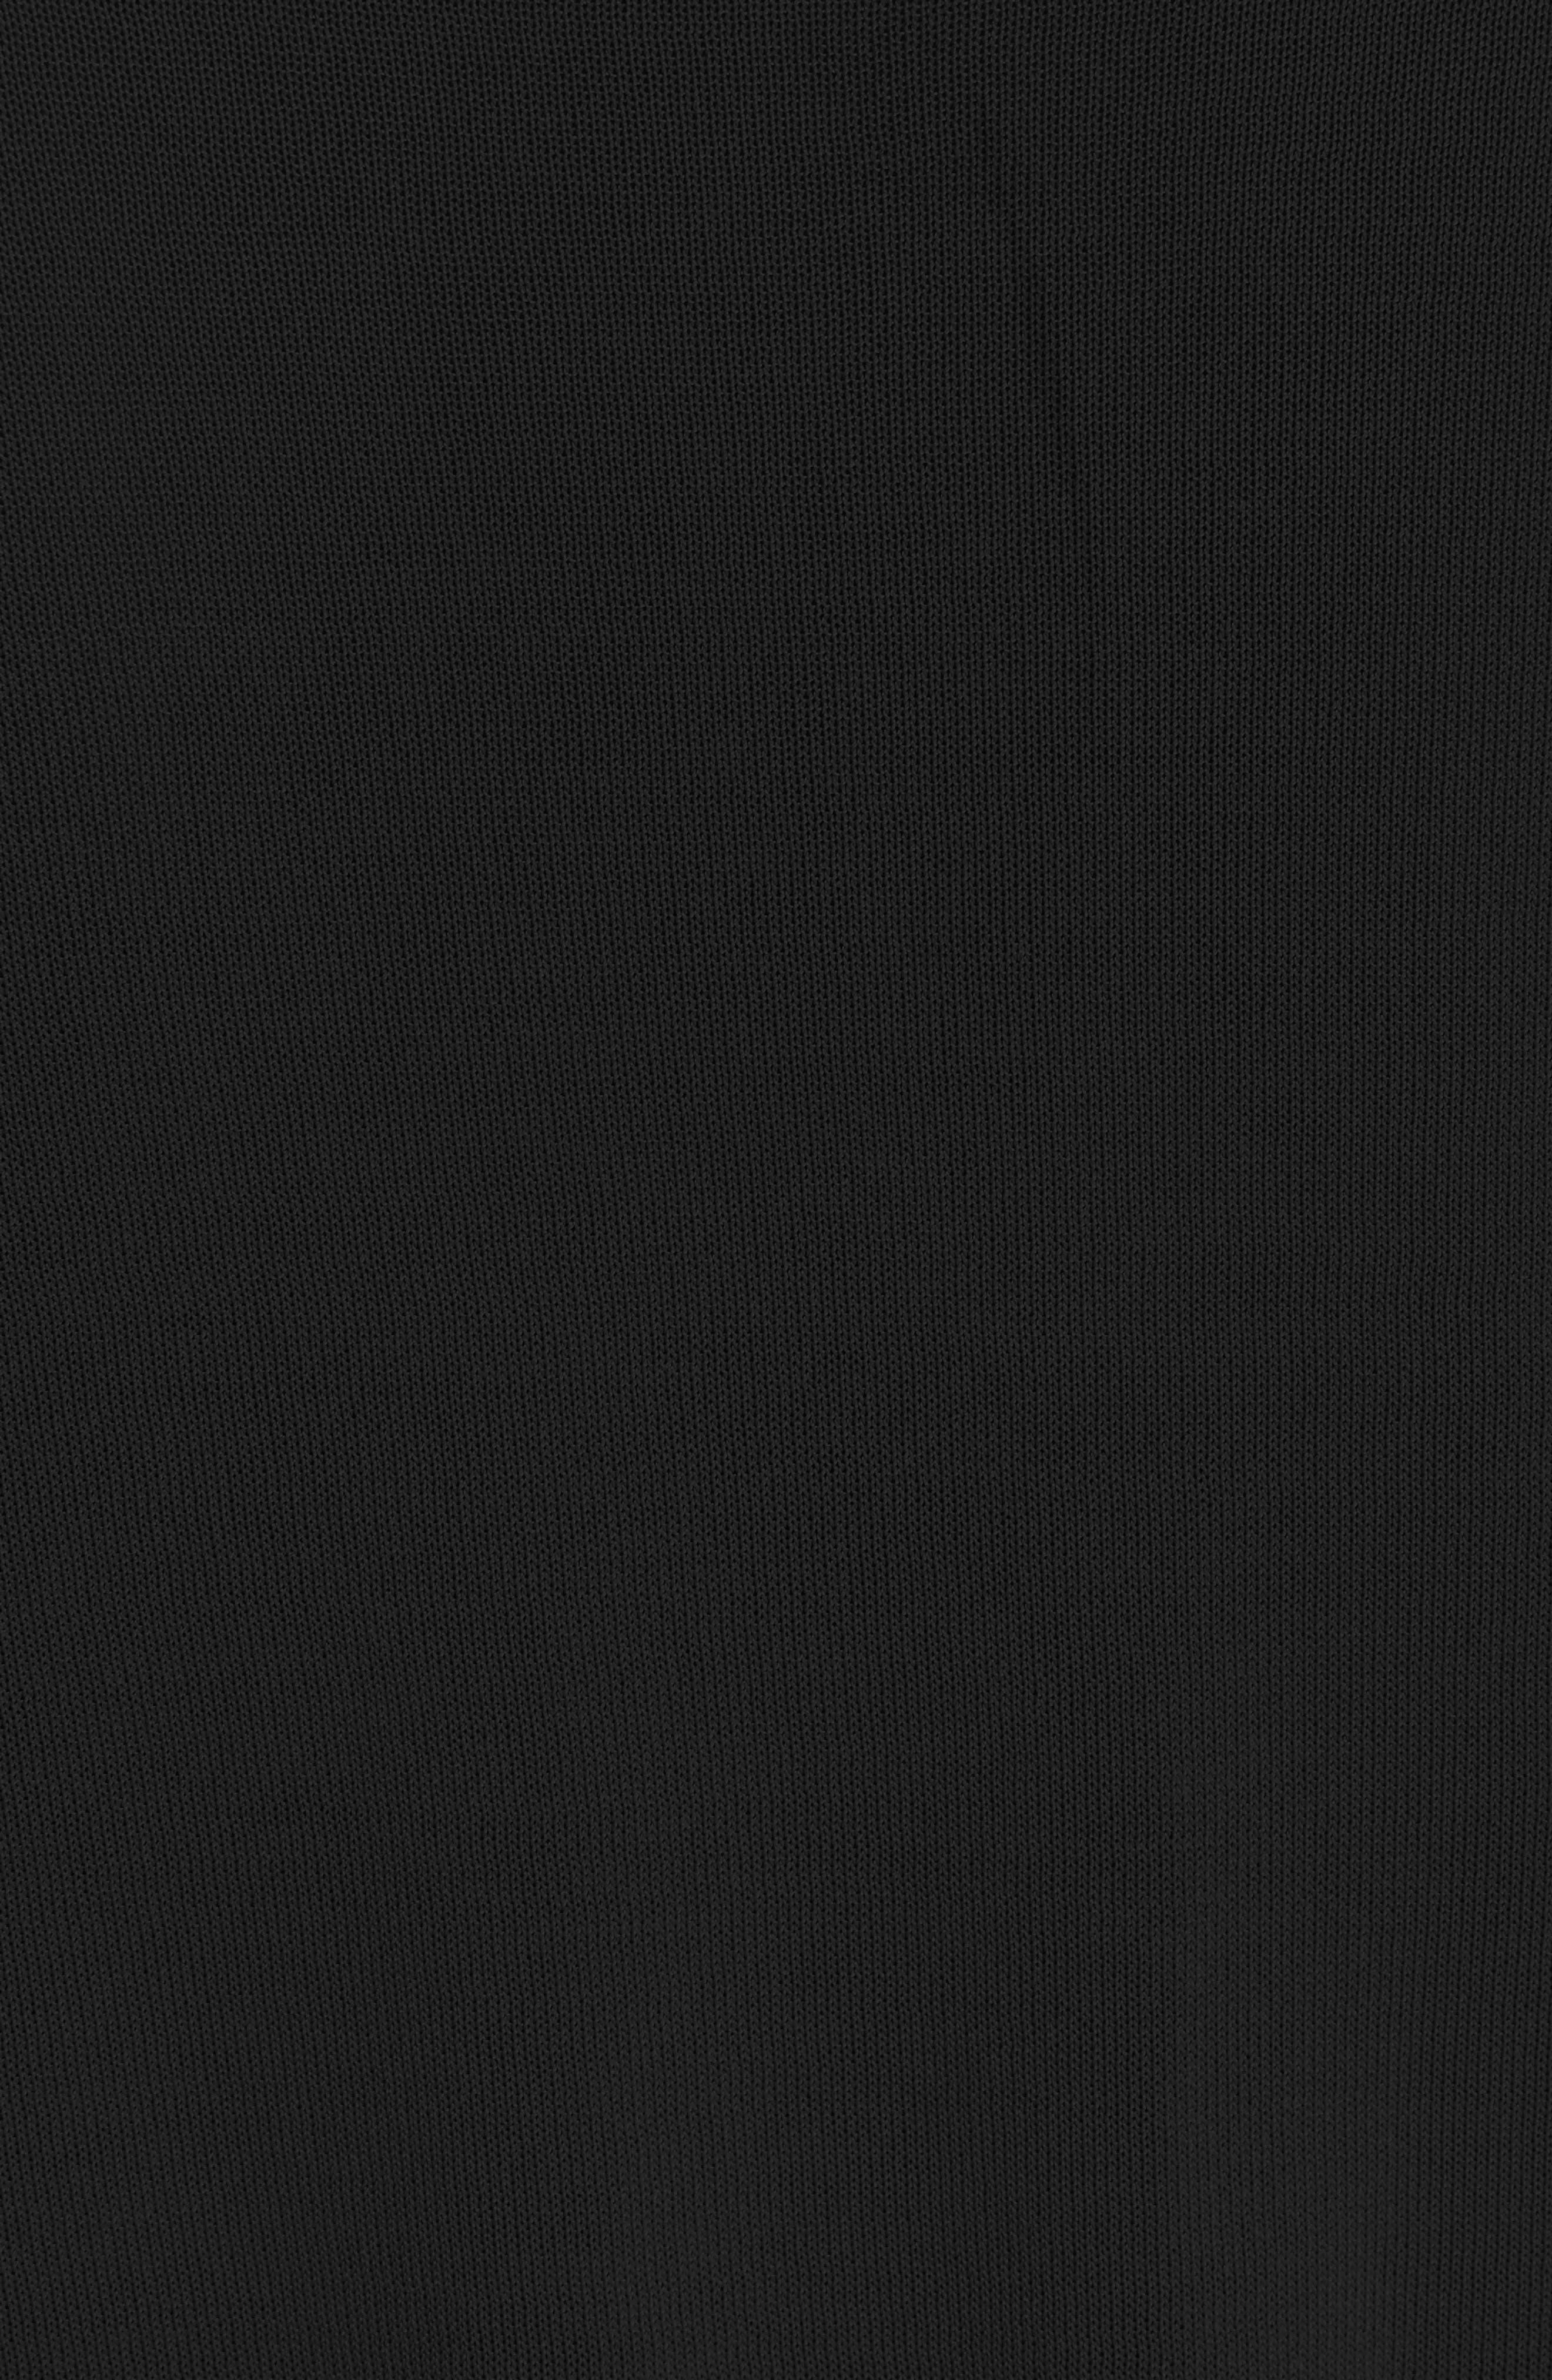 Tricot Knit Top,                             Alternate thumbnail 5, color,                             BLACK